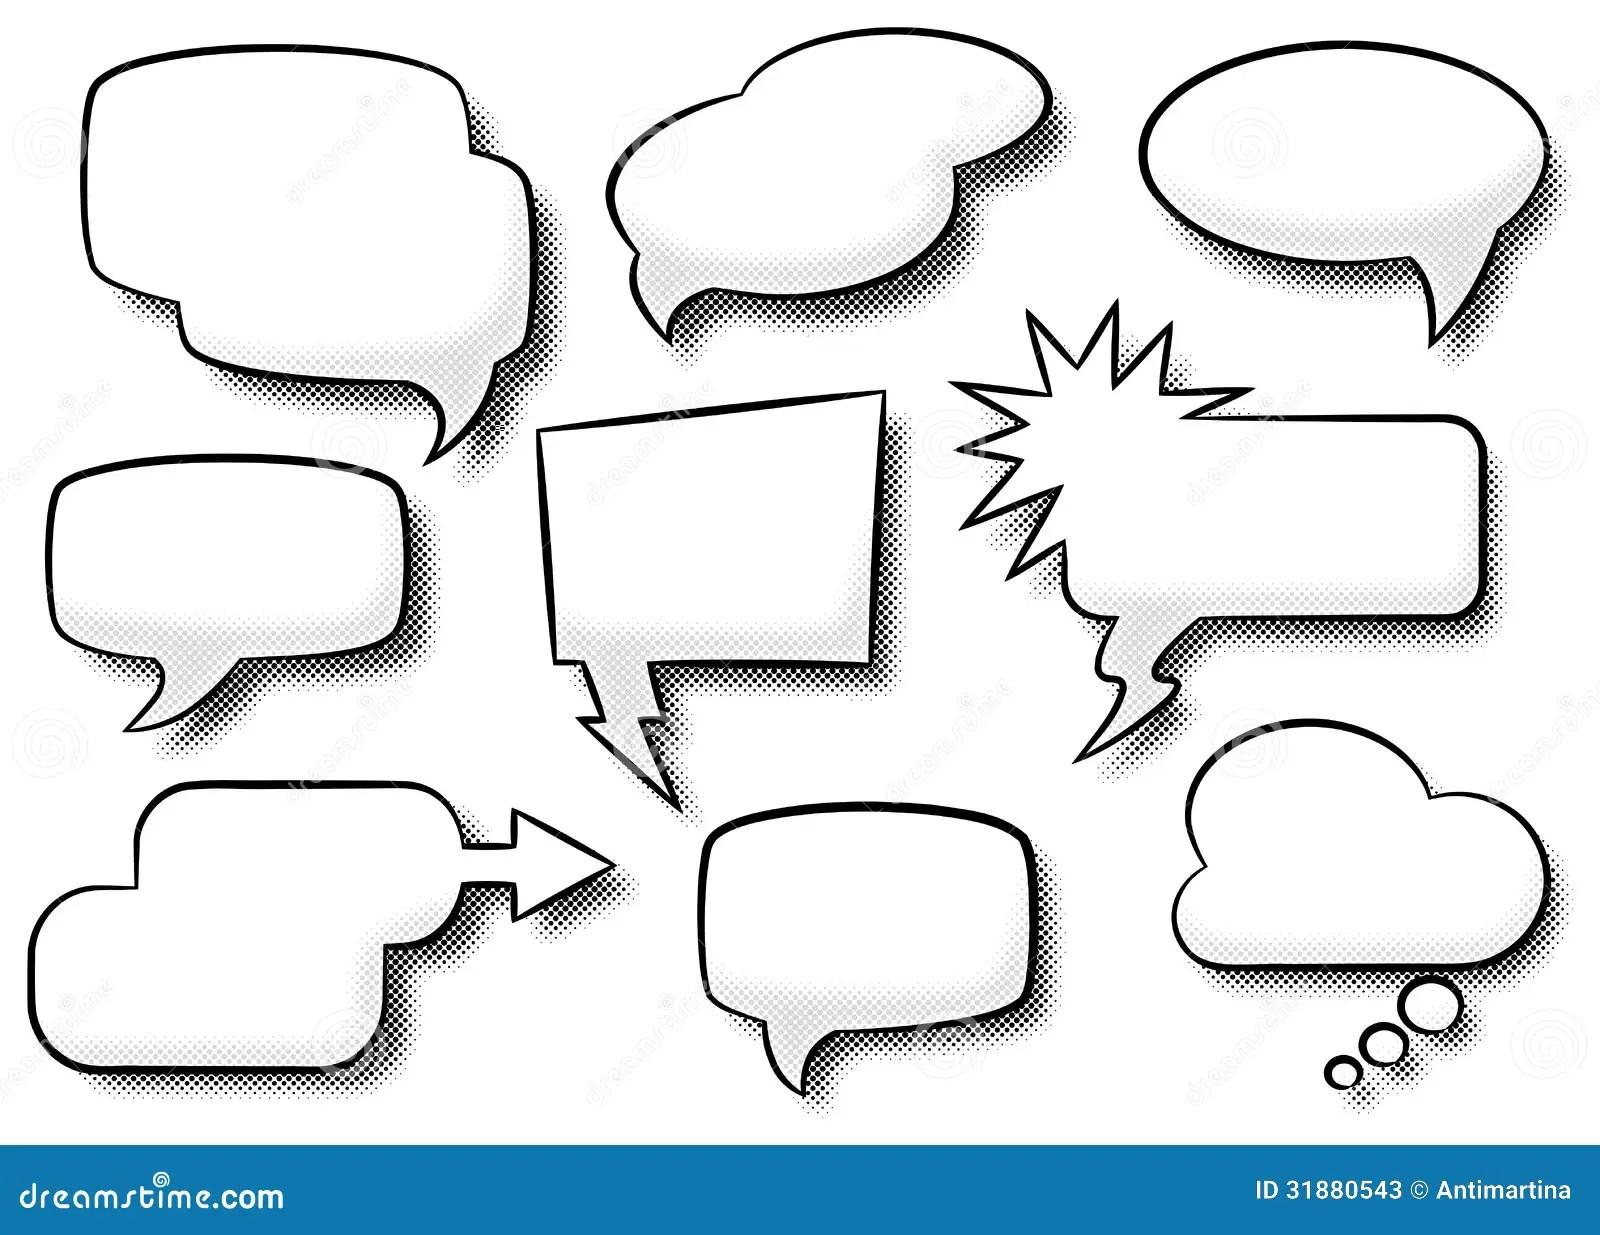 Comic style speech bubbles stock vector. Illustration of